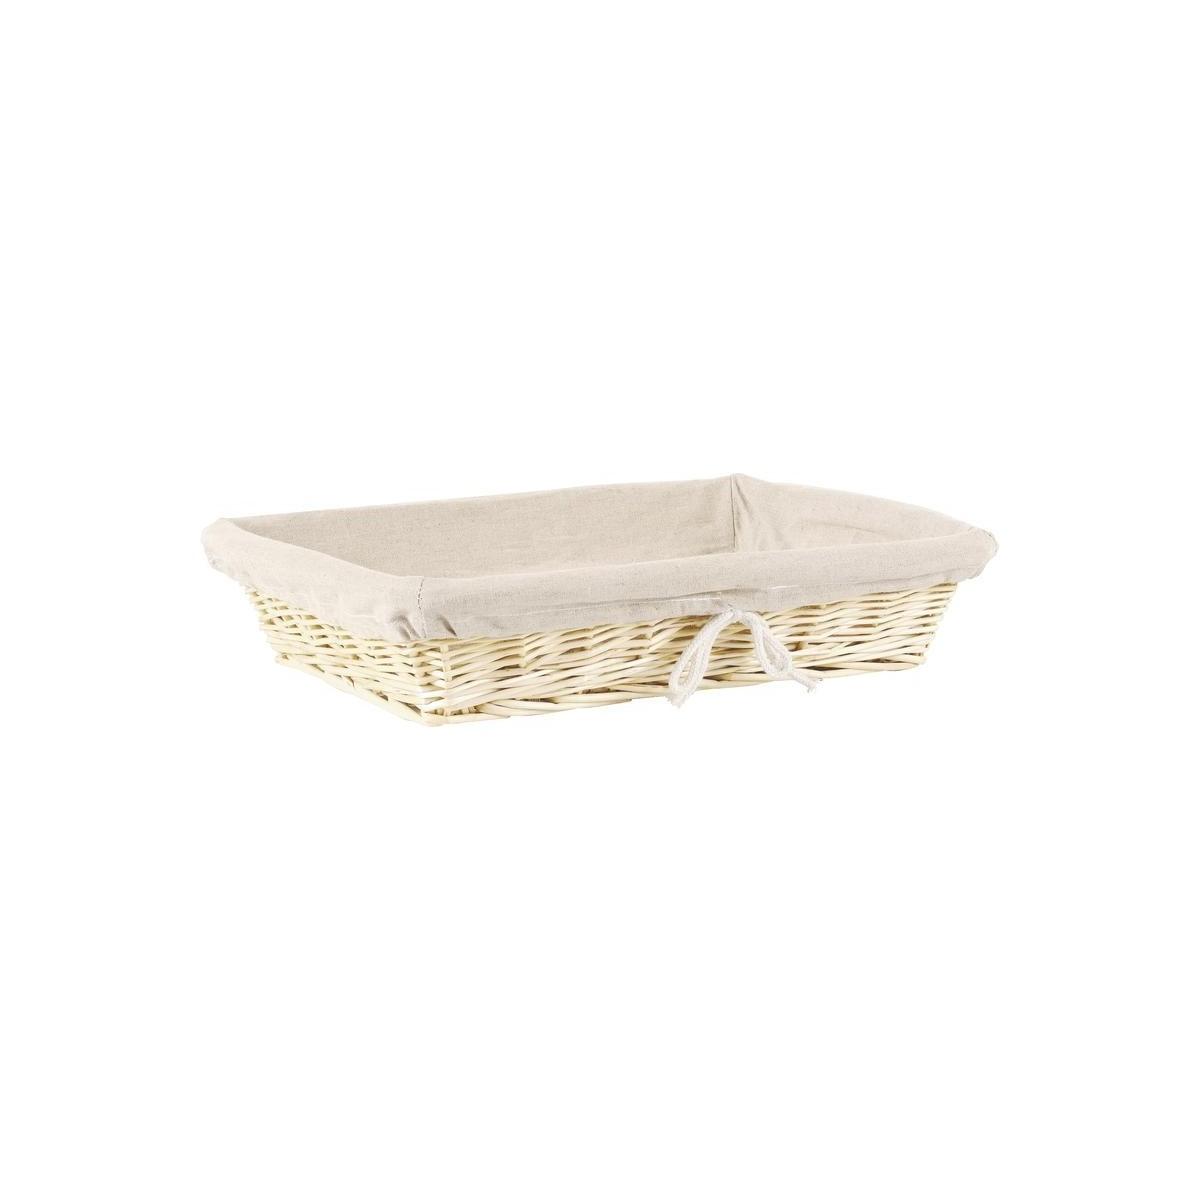 Corbeille en osier blanc et toile de jute 40x30